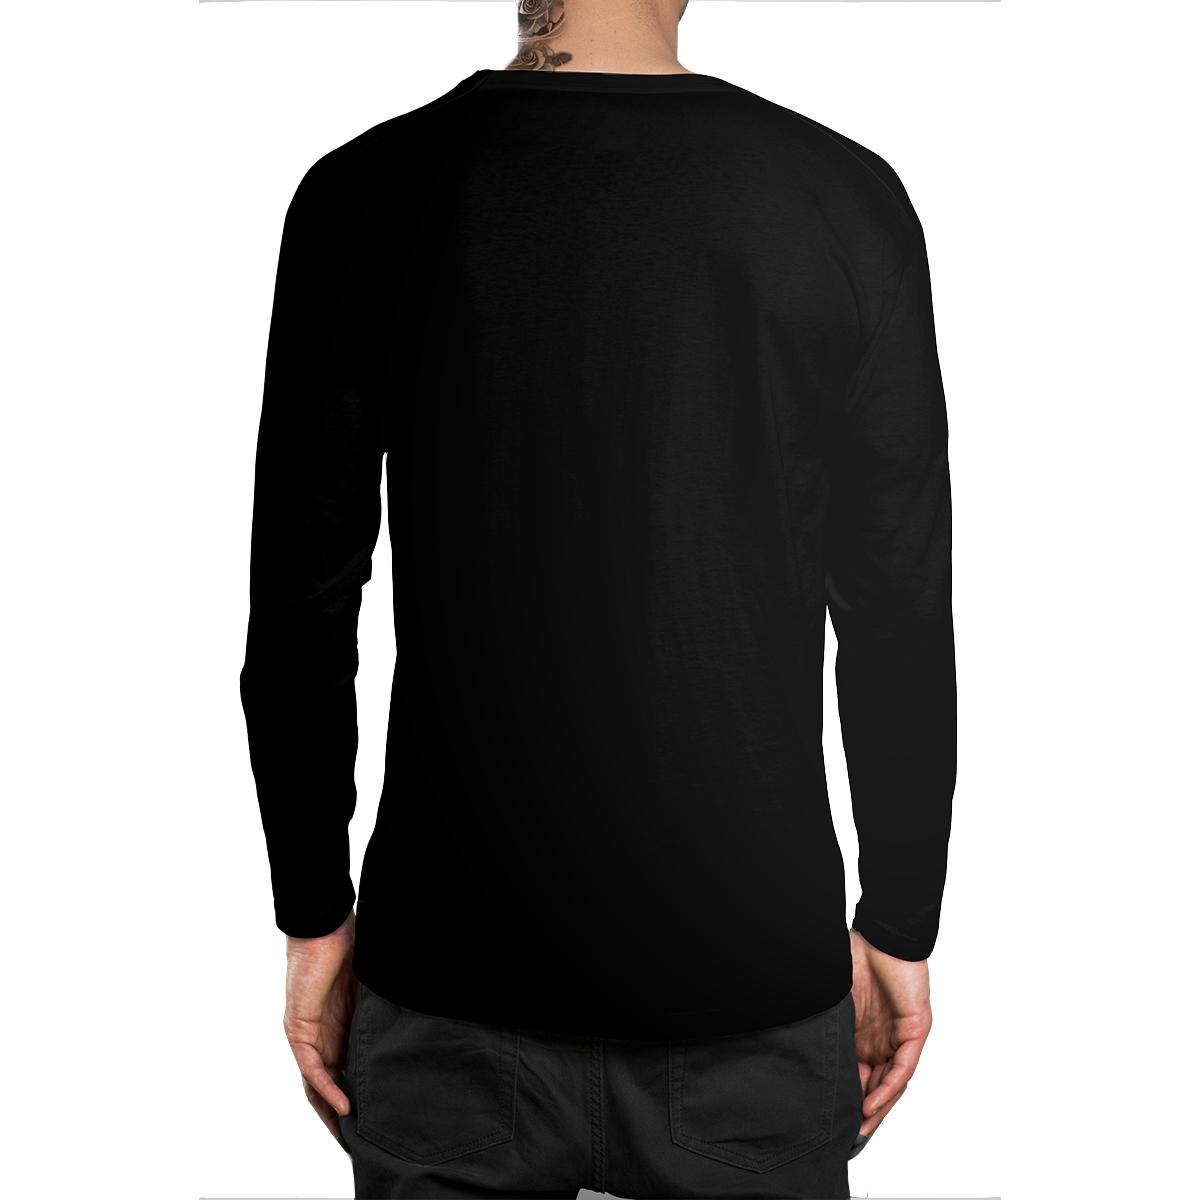 Stompy Camiseta Manga Longa Modelo 45